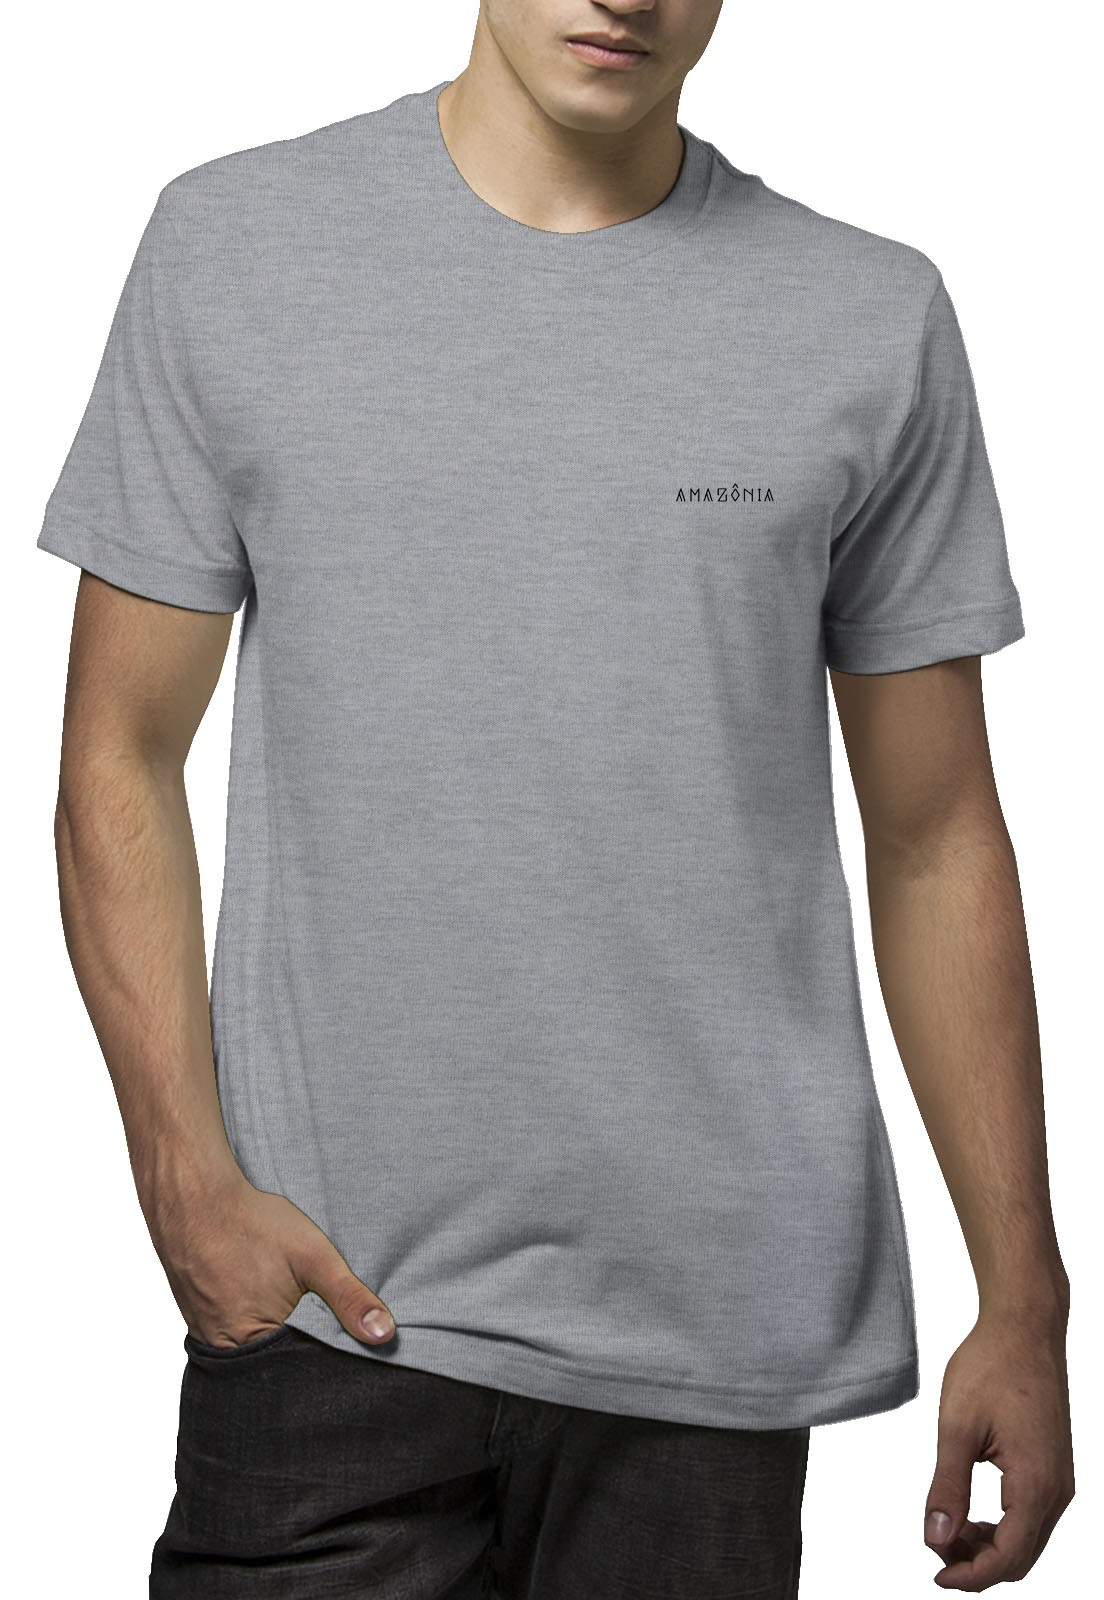 Camiseta Amazônia Cacique Cocar - Mescla